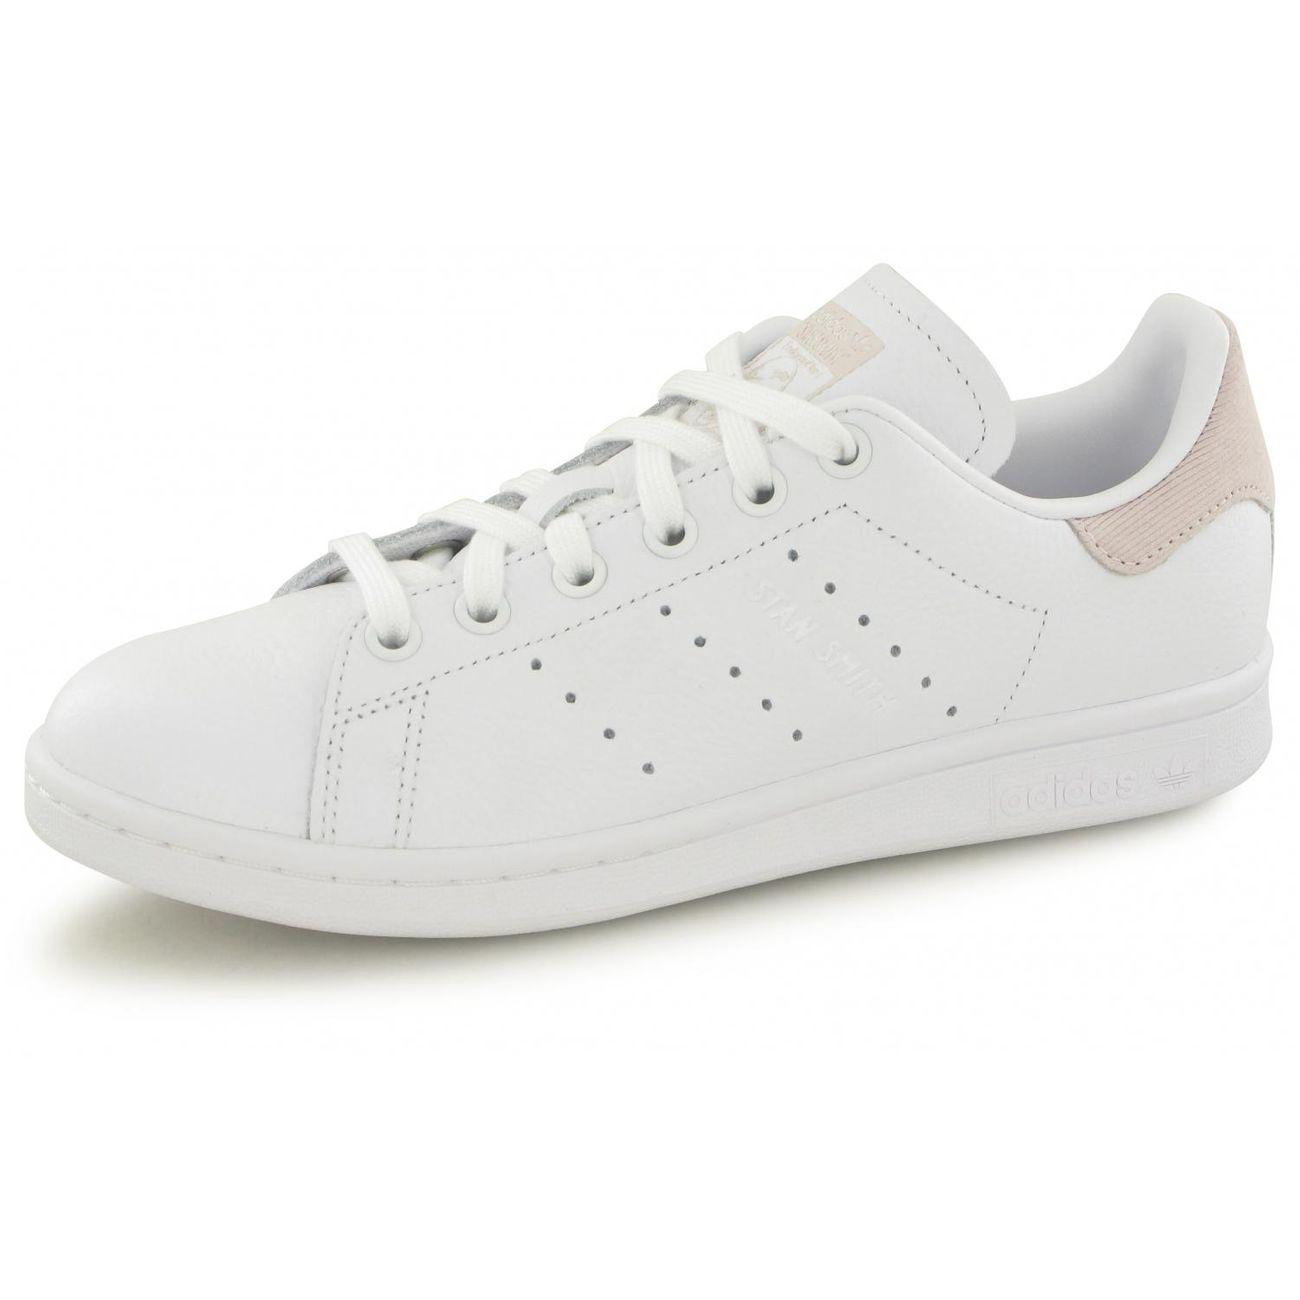 ... Mode- Lifestyle femme ADIDAS Baskets Adidas Stan Smith Blanc Femme ...